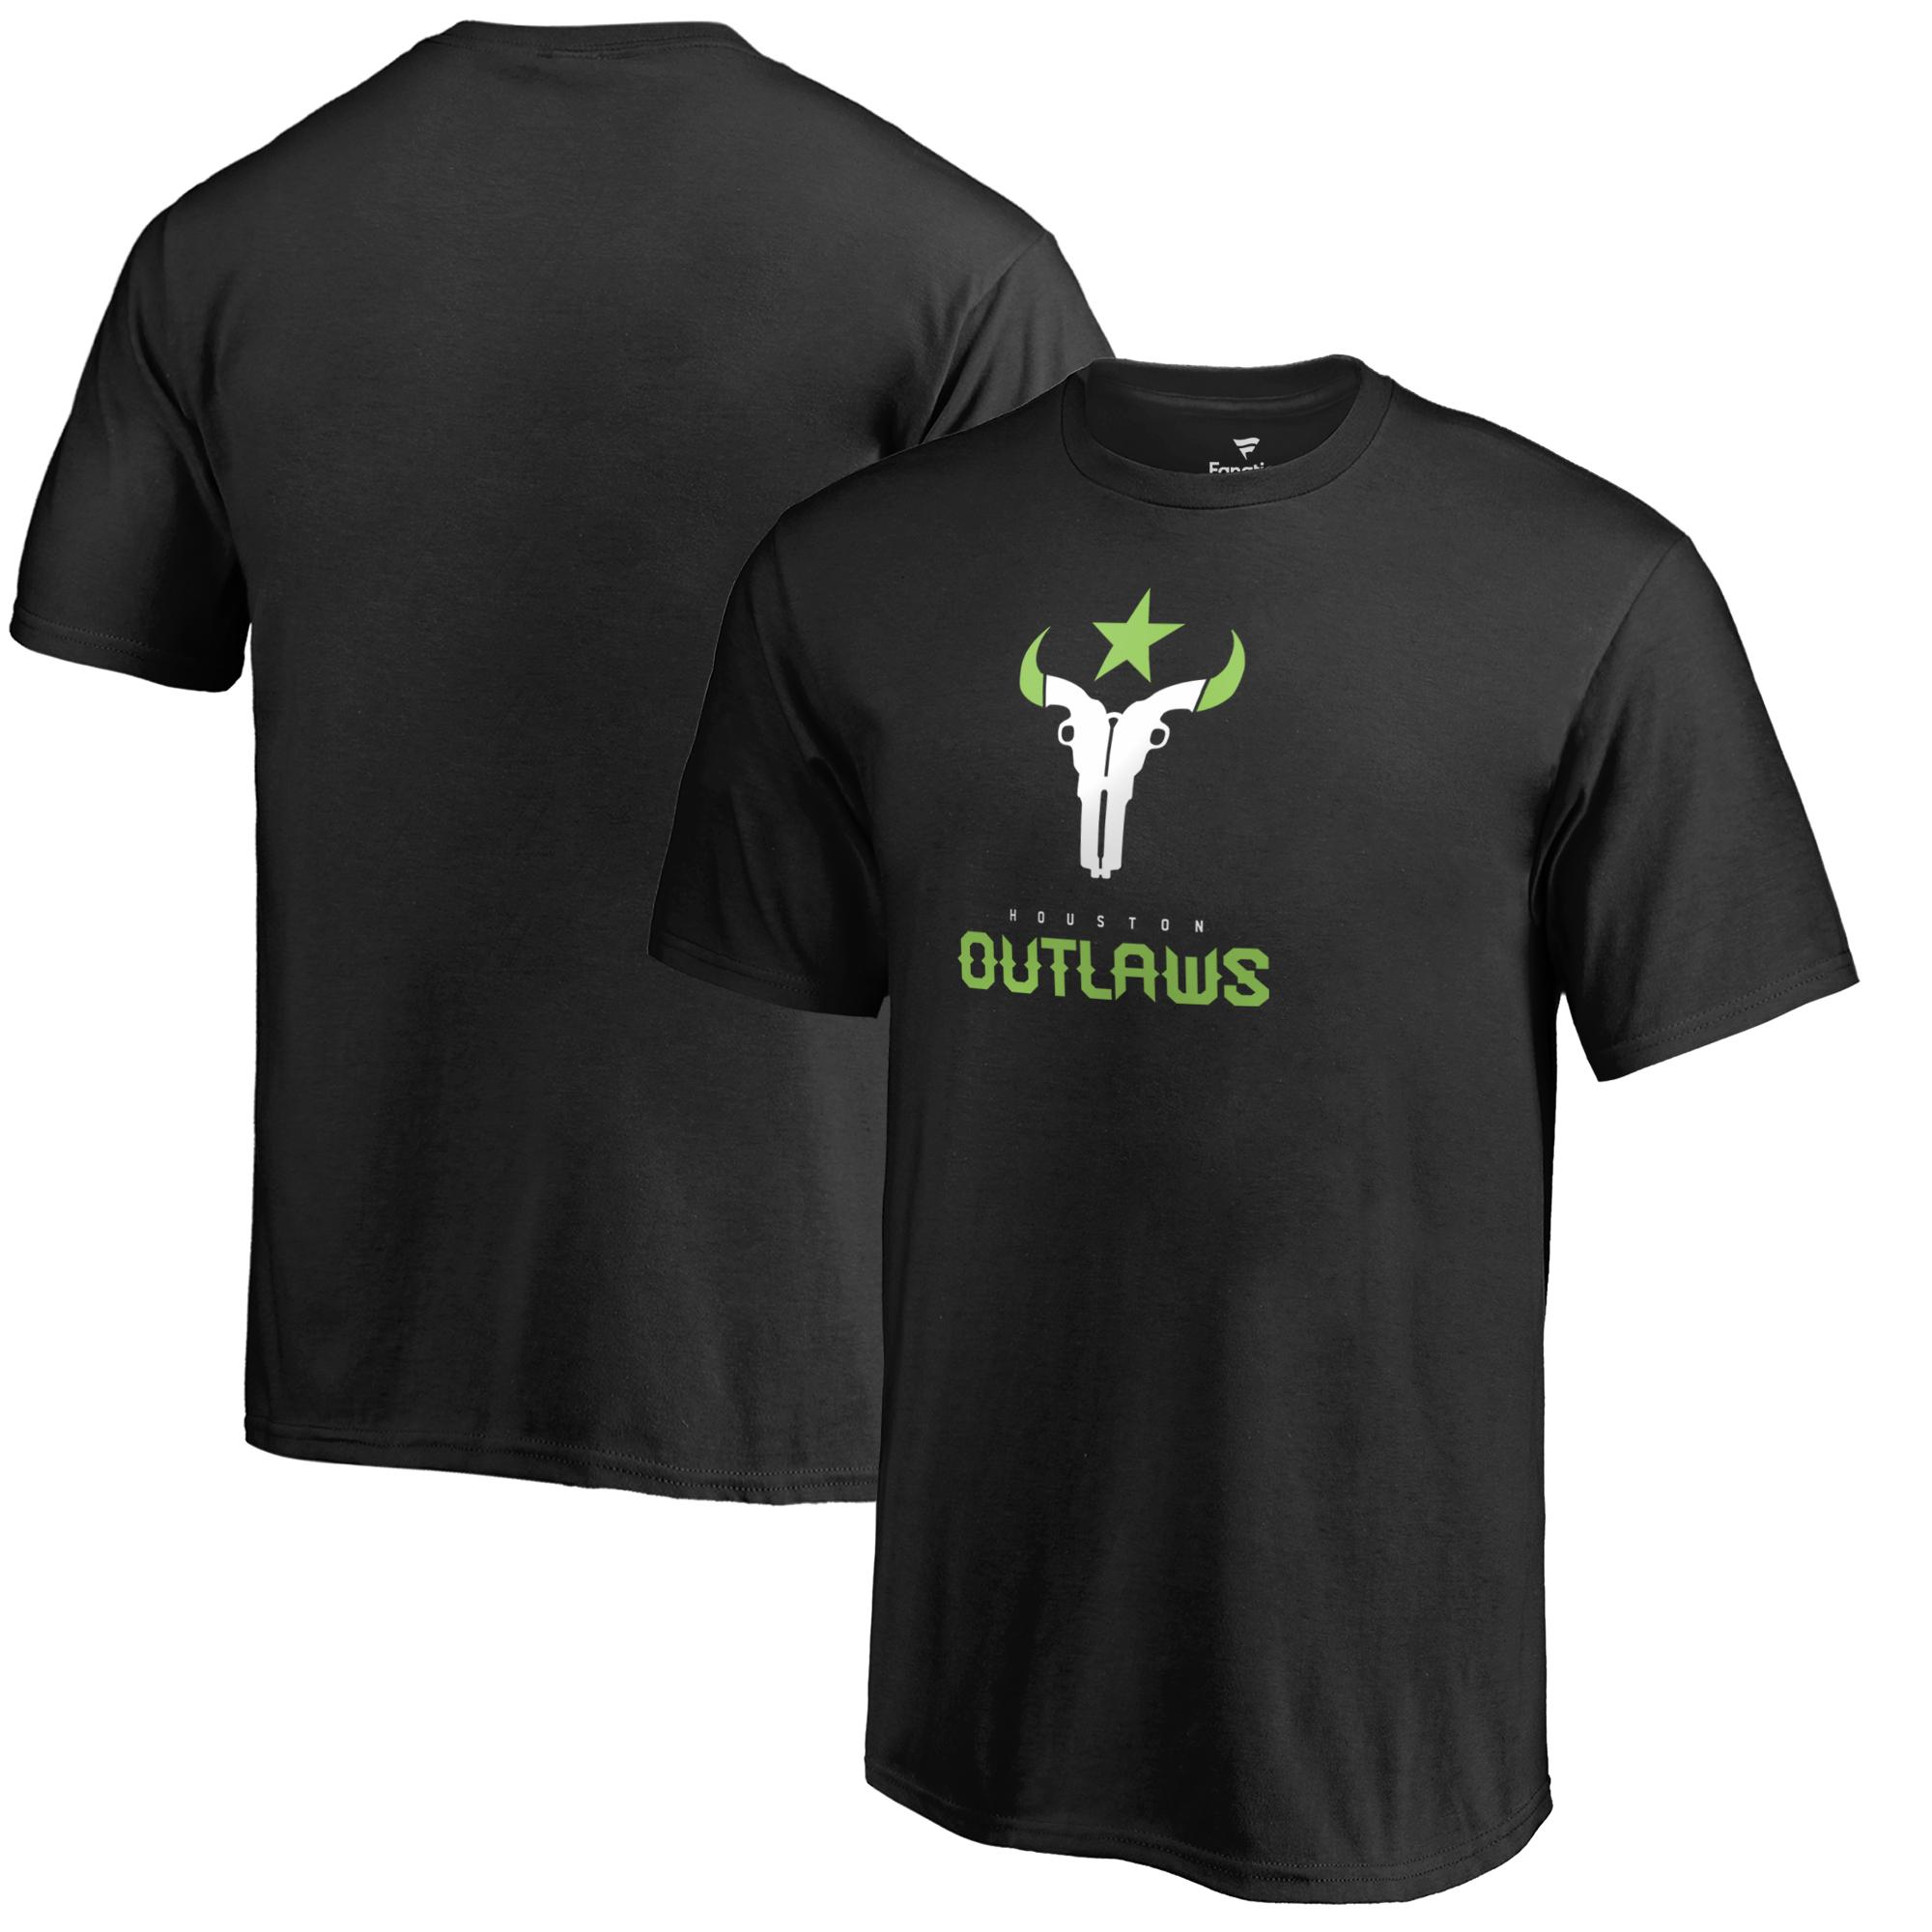 Houston Outlaws Fanatics Branded Youth Team Identity T-Shirt - Black